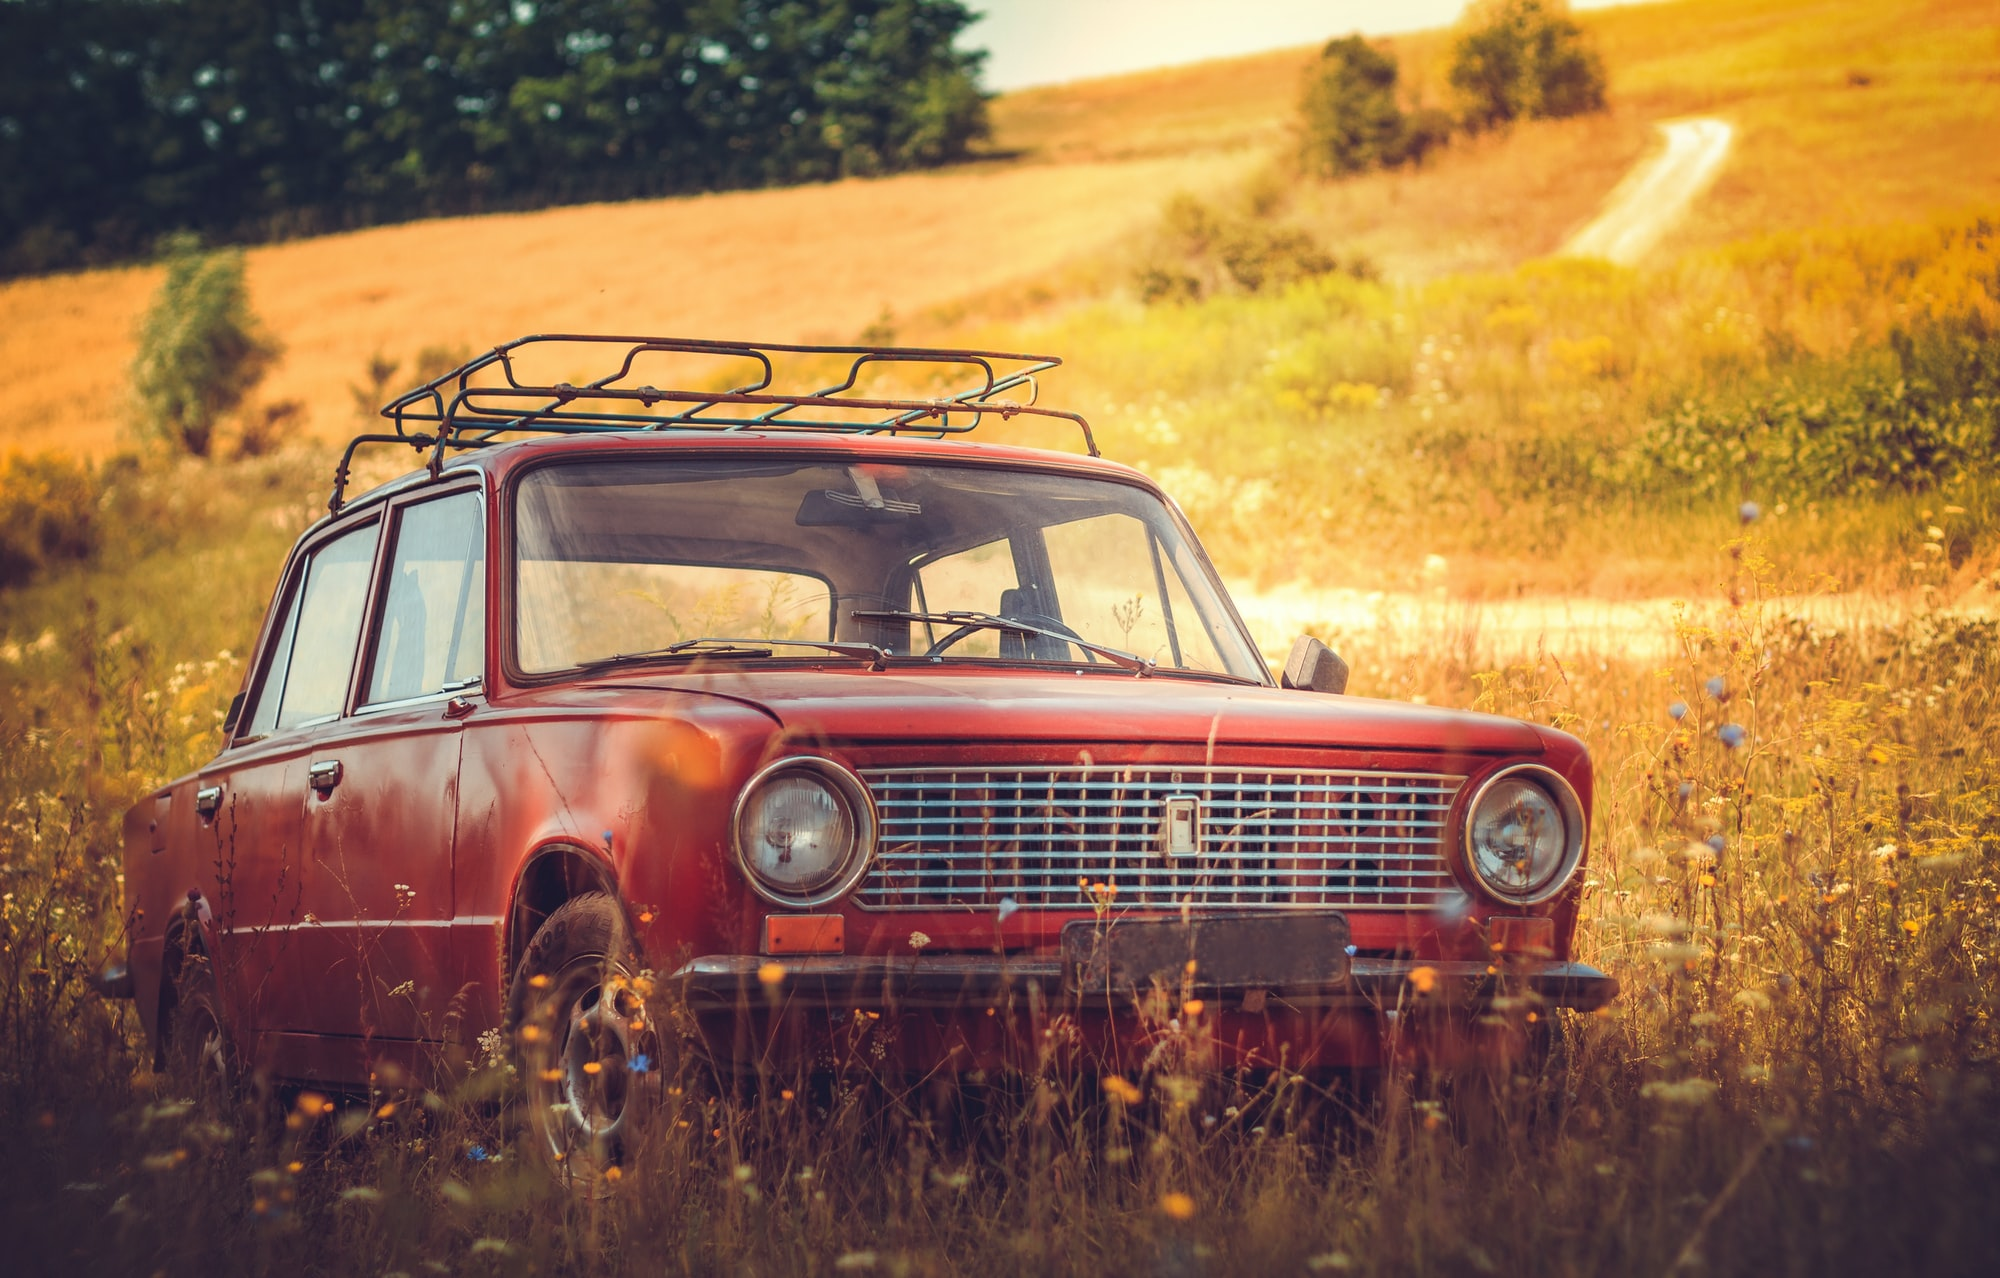 Car in the field